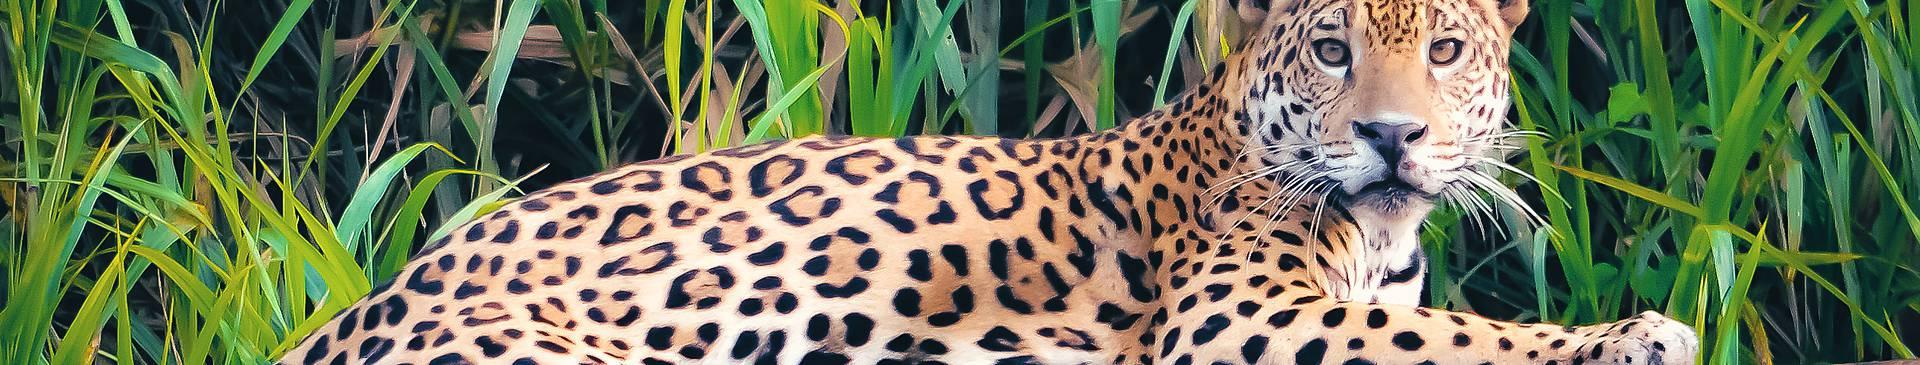 Peru rainforest tours